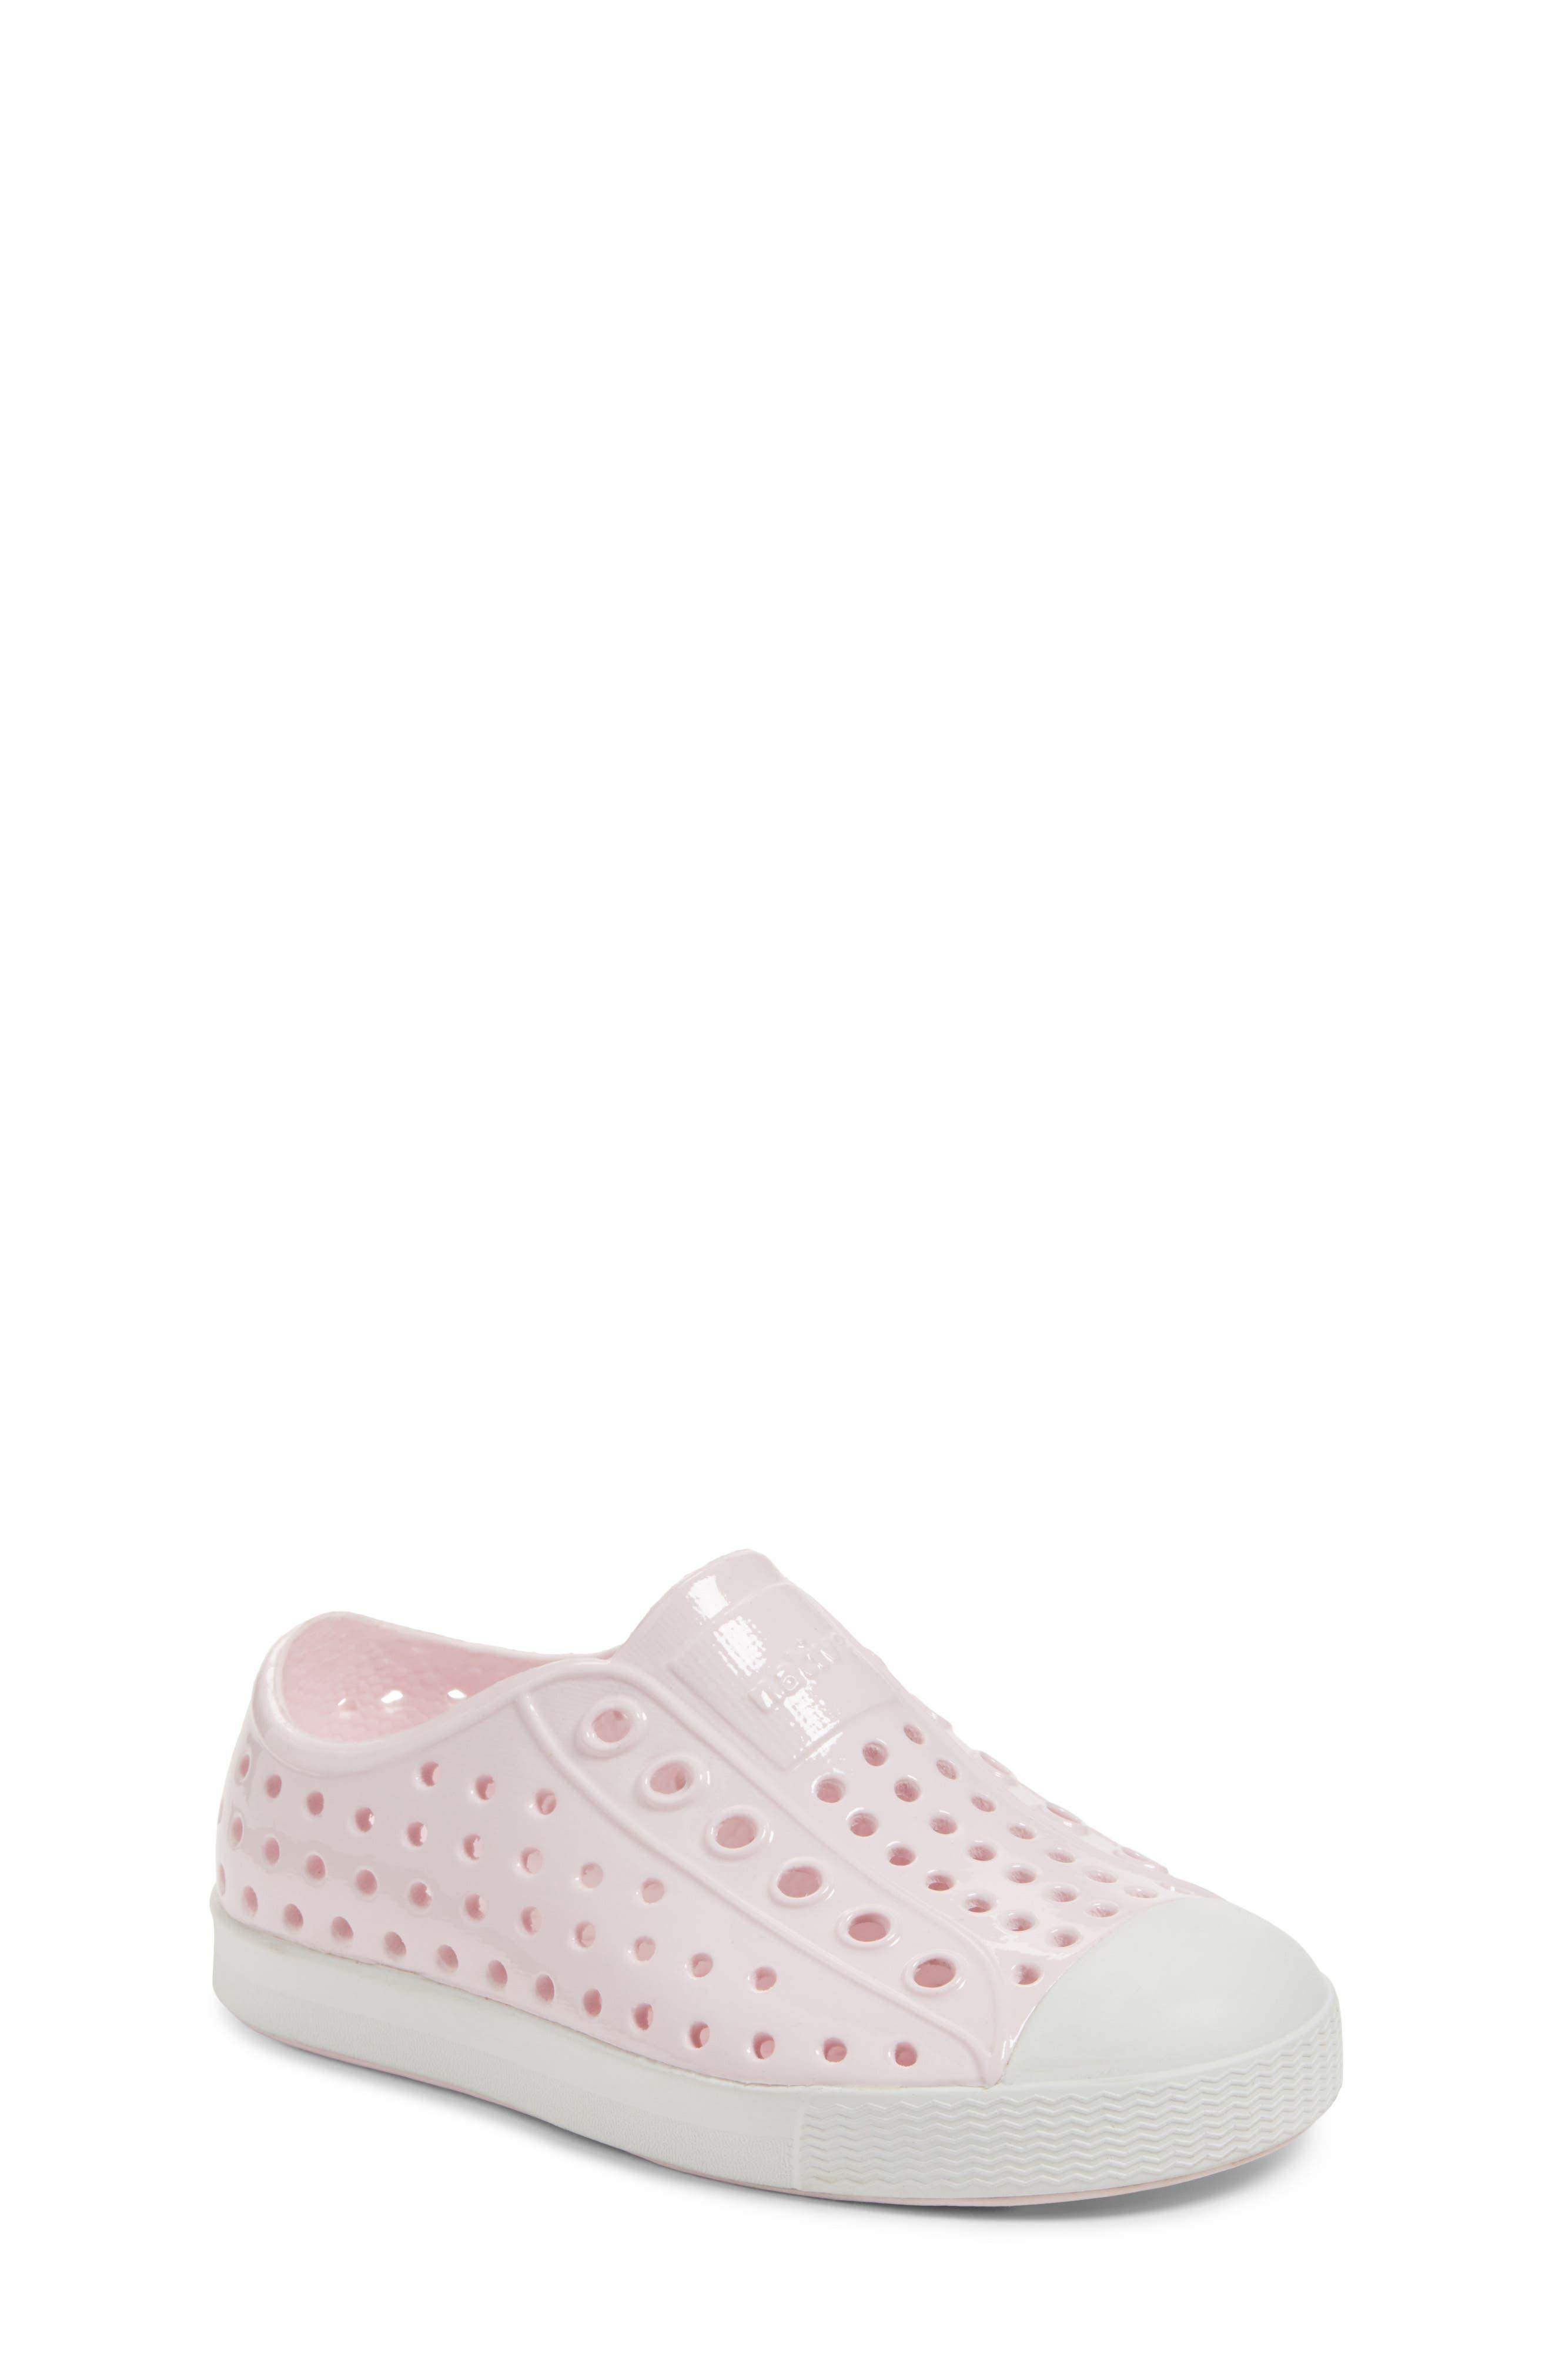 Jefferson Glossy Slip-On Sneaker,                         Main,                         color, MILK PINK/ SHELL WHITE